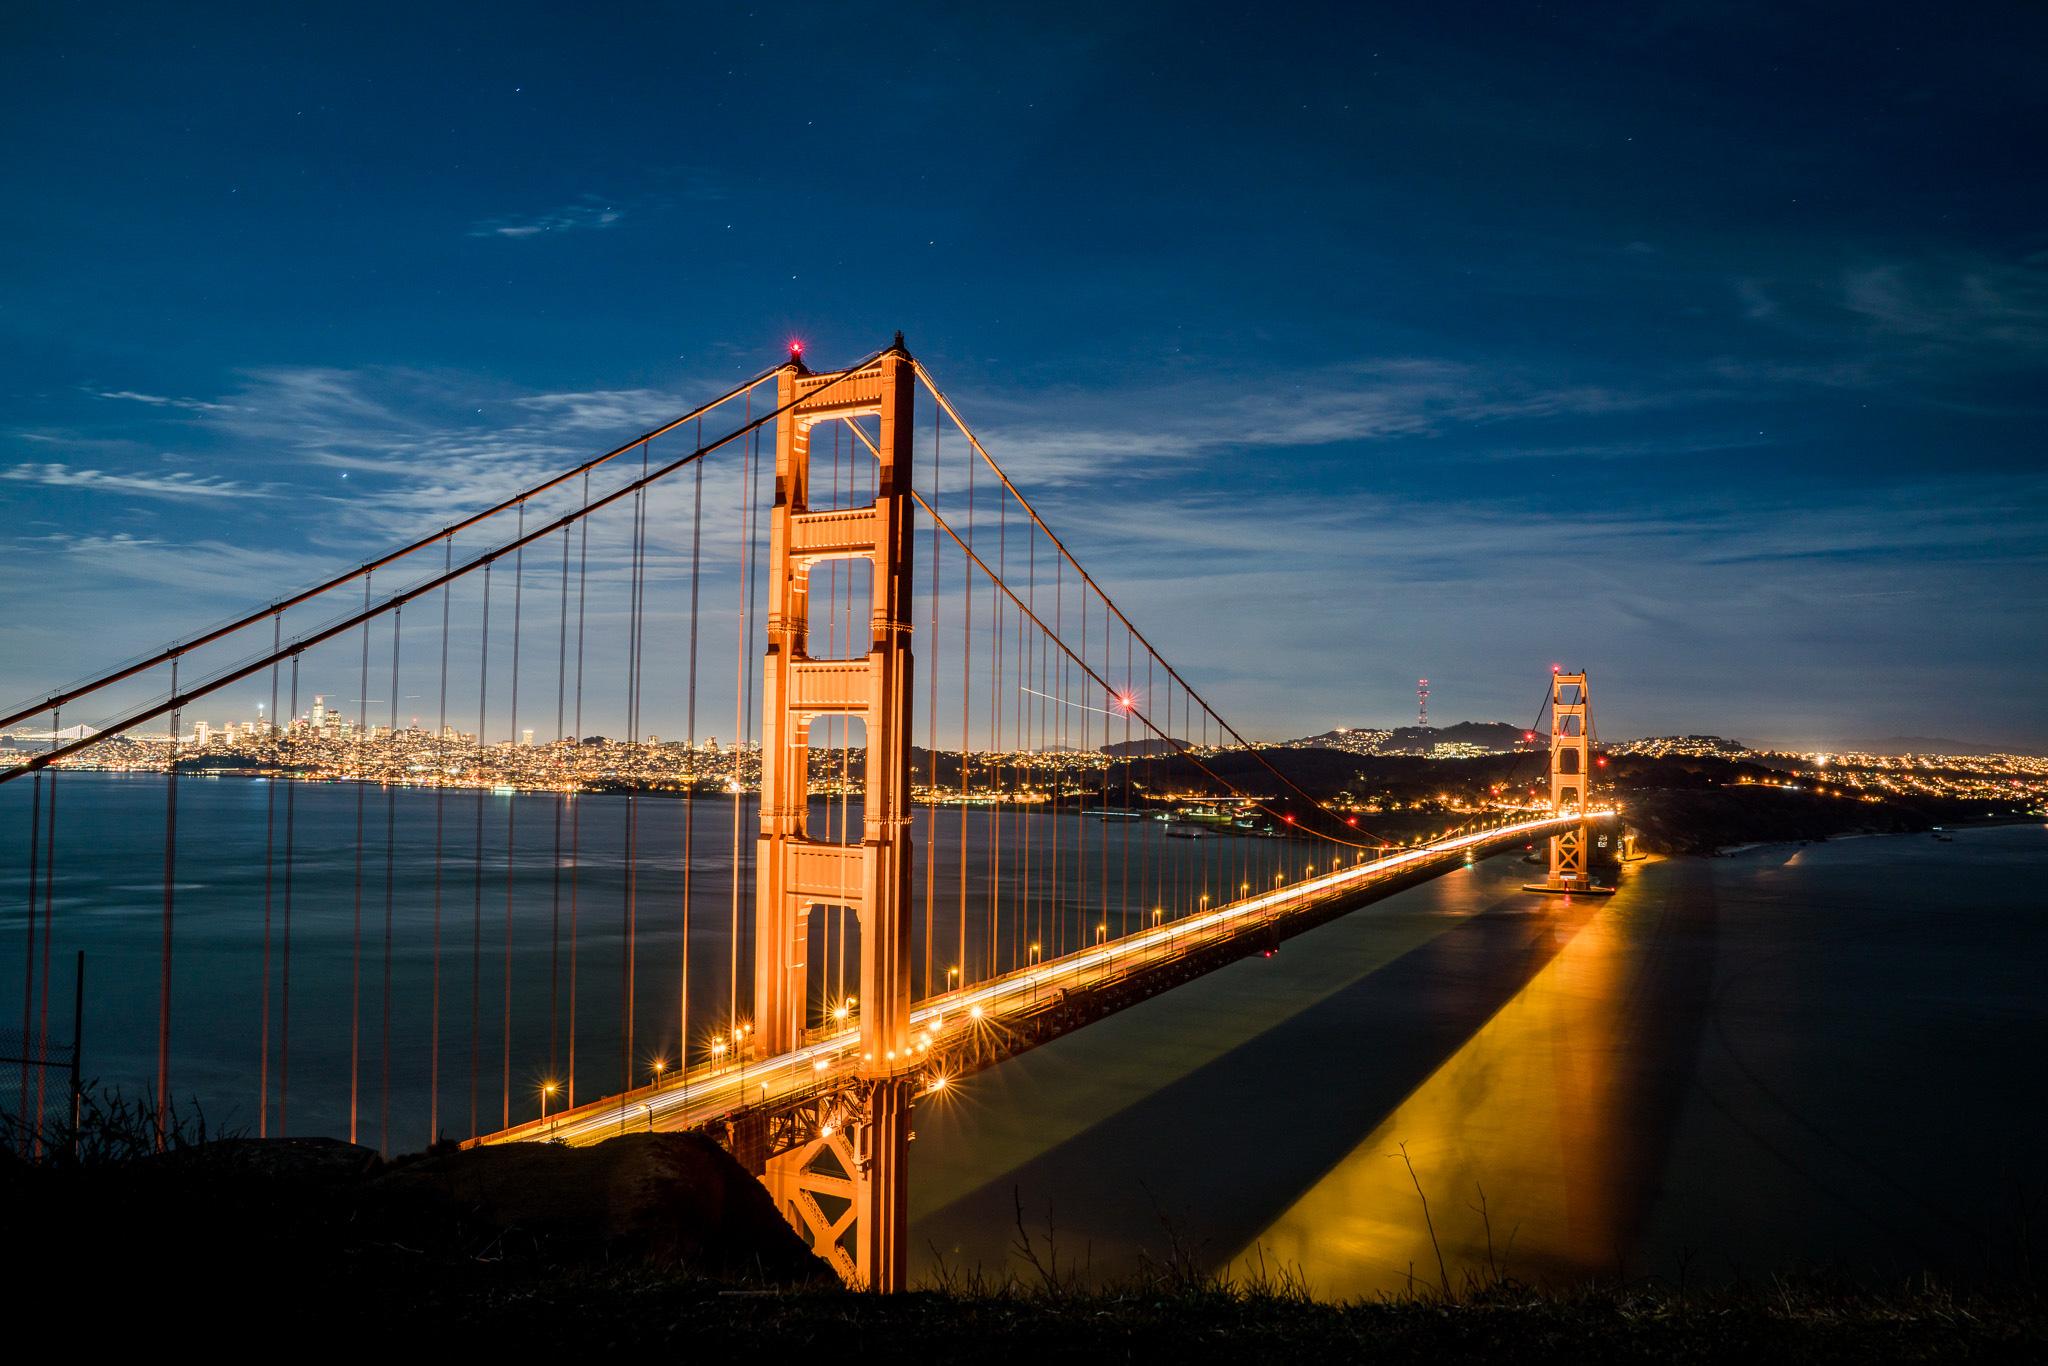 1920x1200 Golden Gate Bridge 1080p Resolution Hd 4k Wallpapers